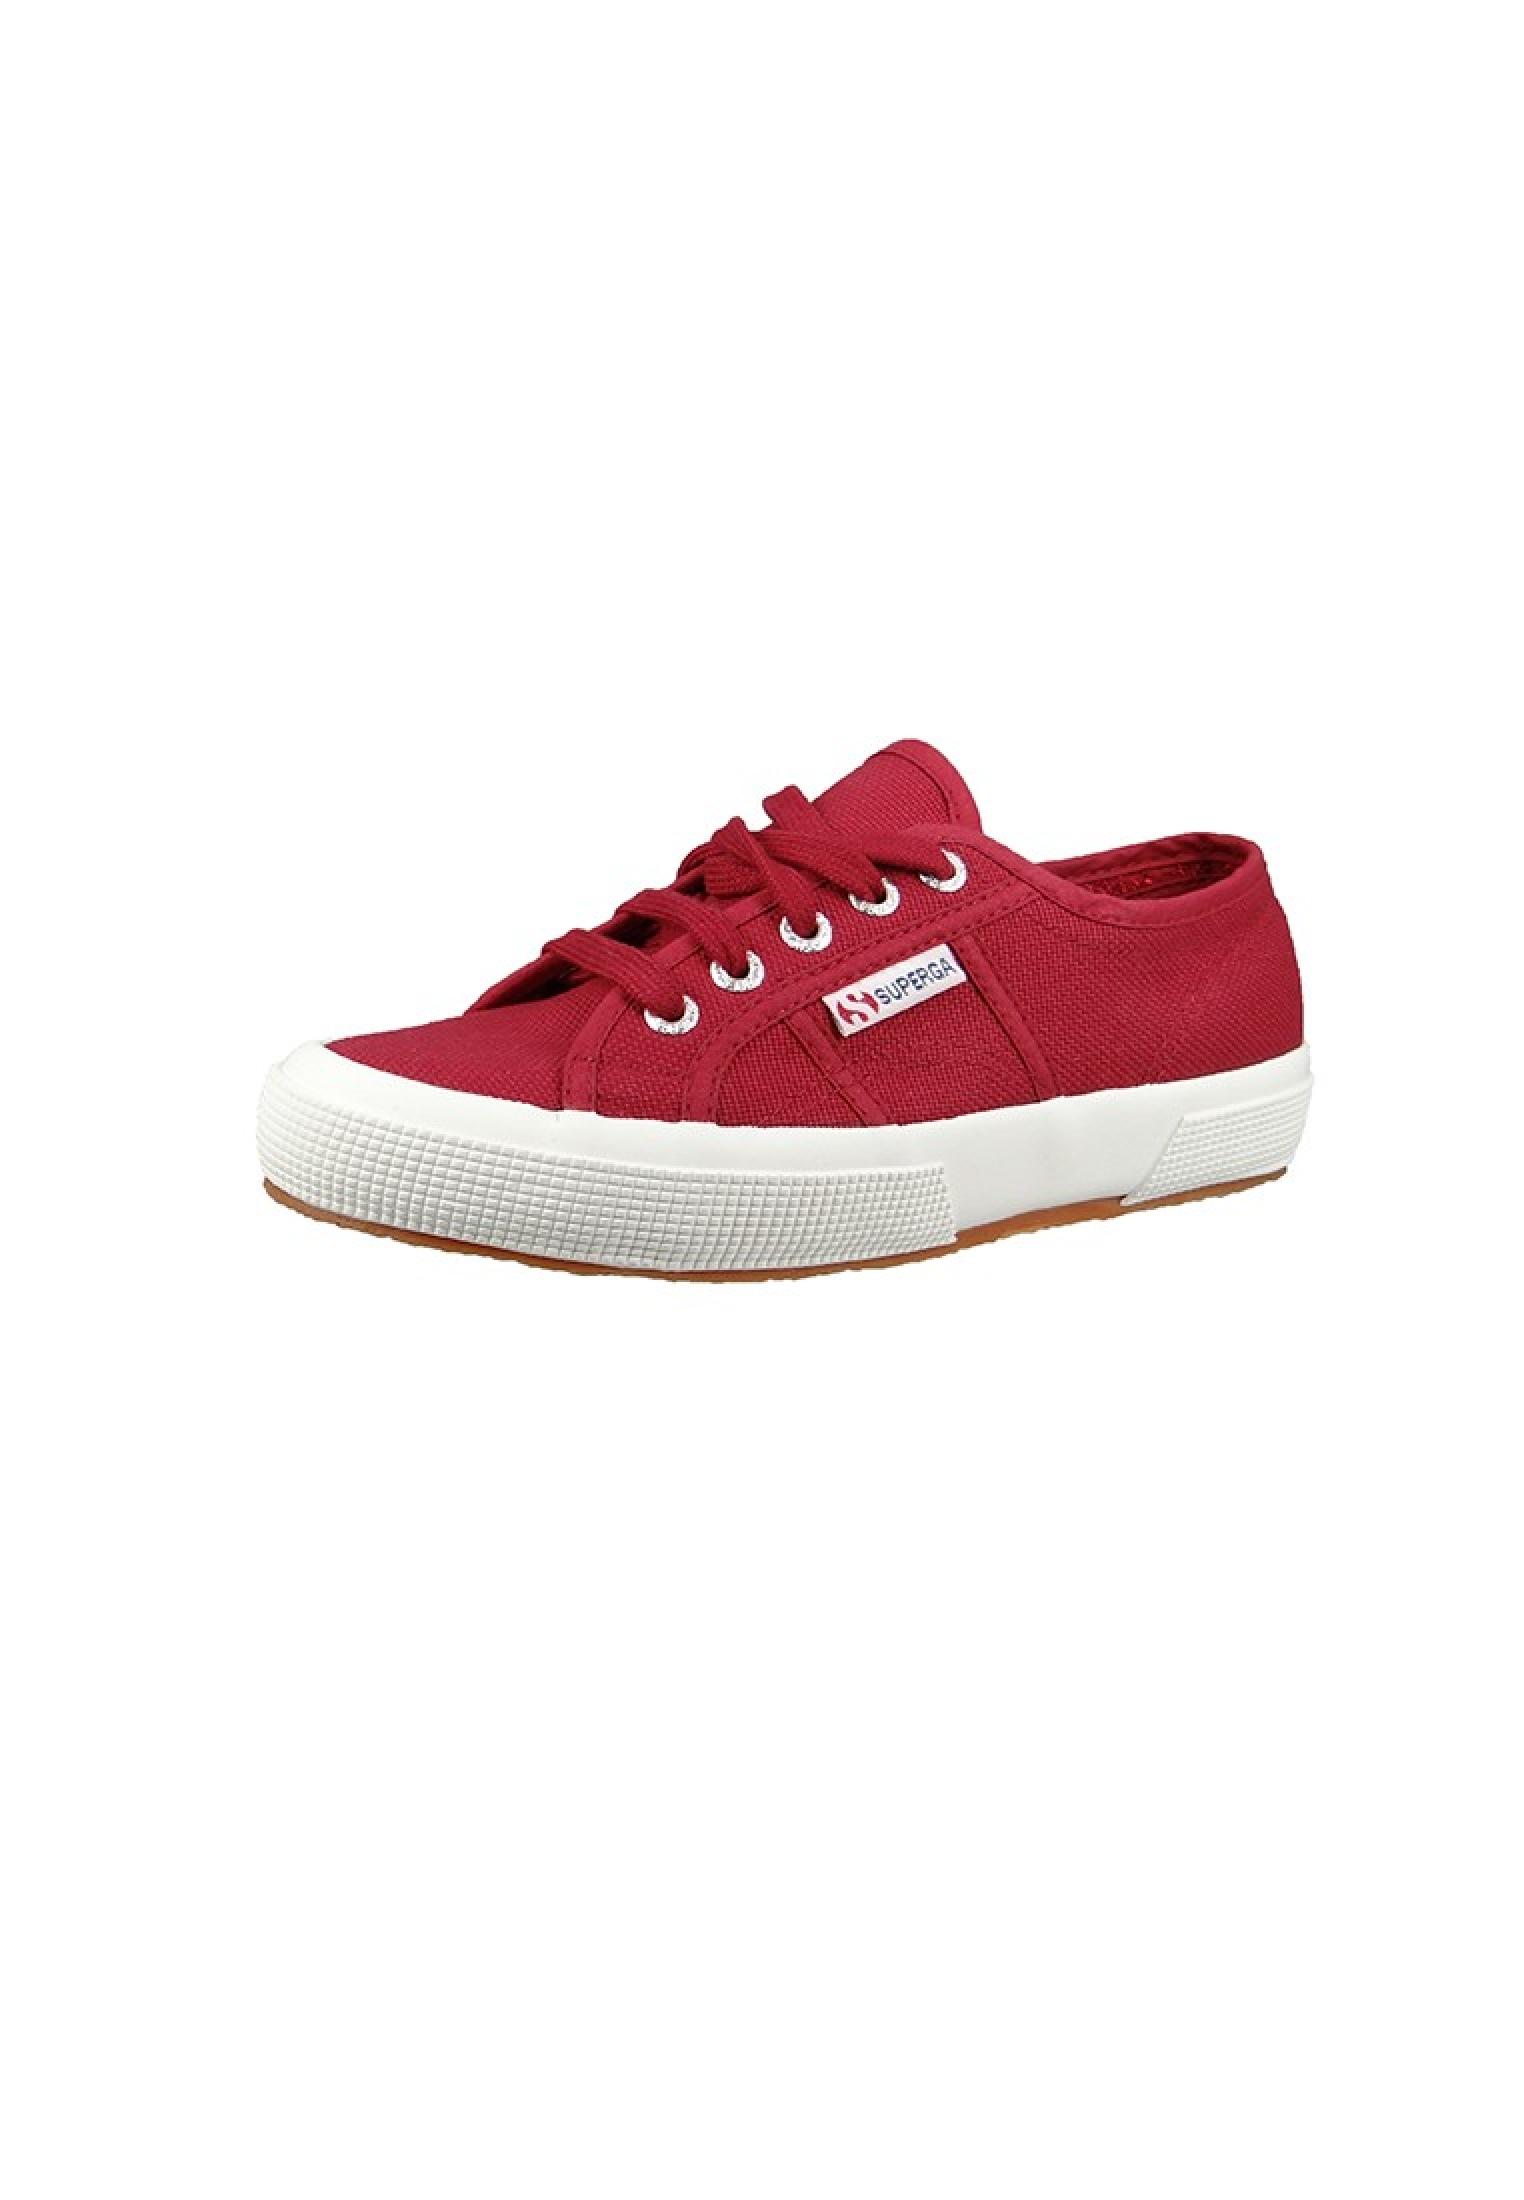 Sneaker Bordeaux 2750 Rot Scarlet Superga Schuhe Classic Cotu KlF1J3Tc